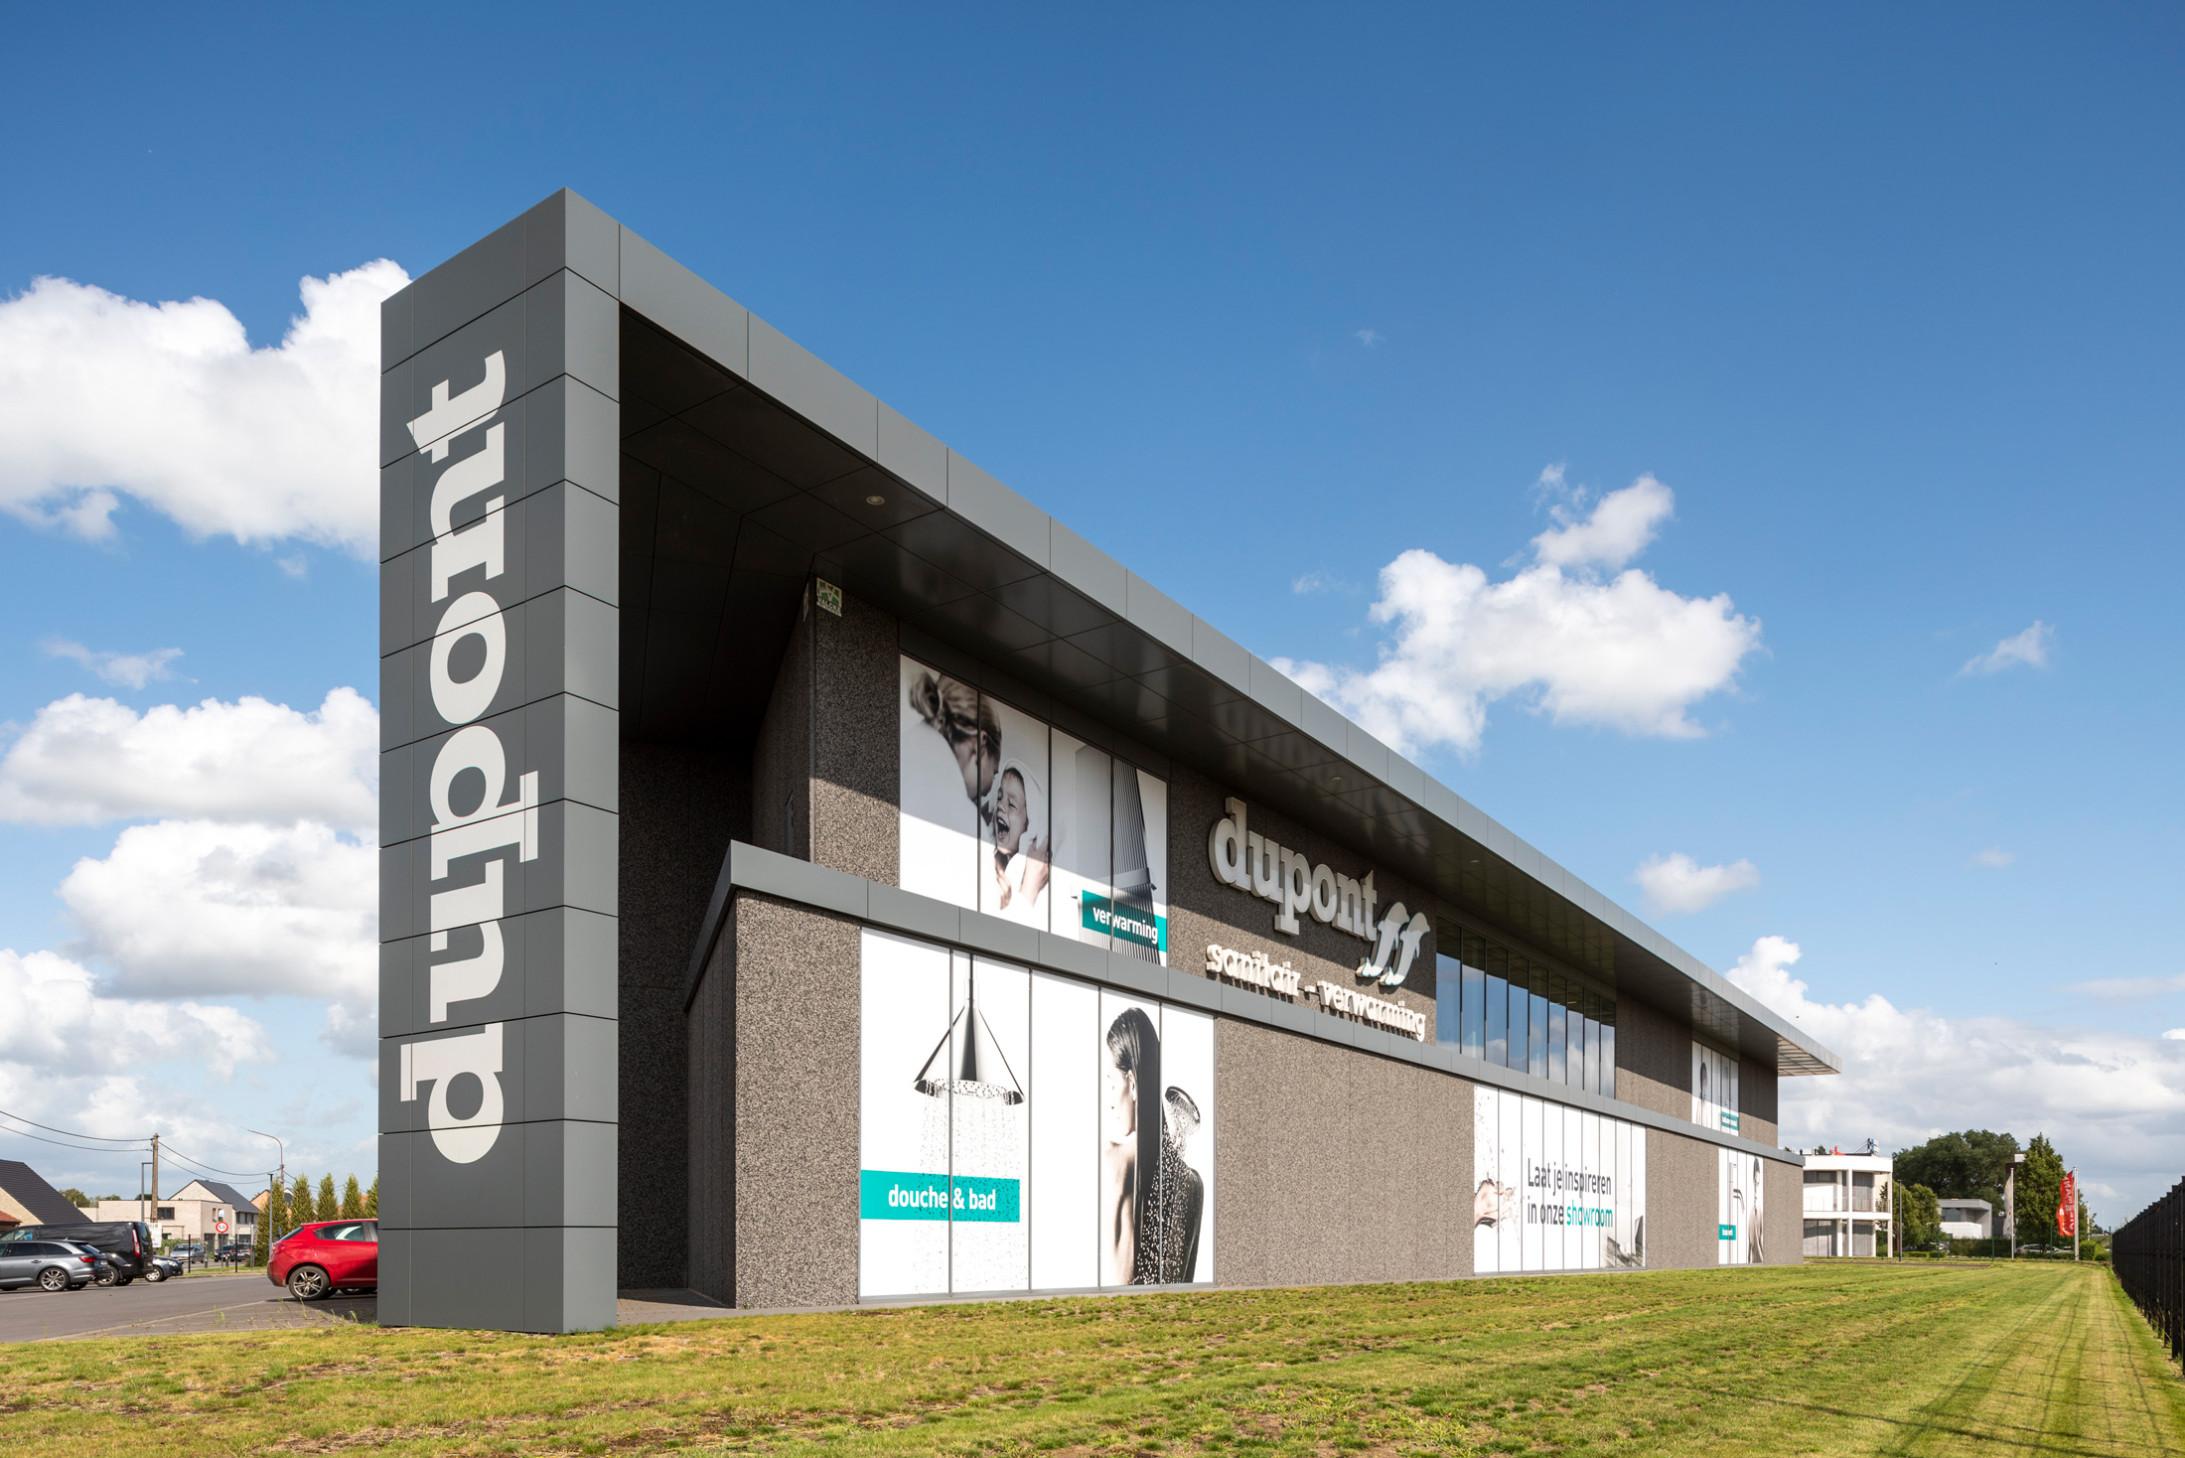 Winkelruimte Dupont4_Roeselare_Claeys Architecten.jpg